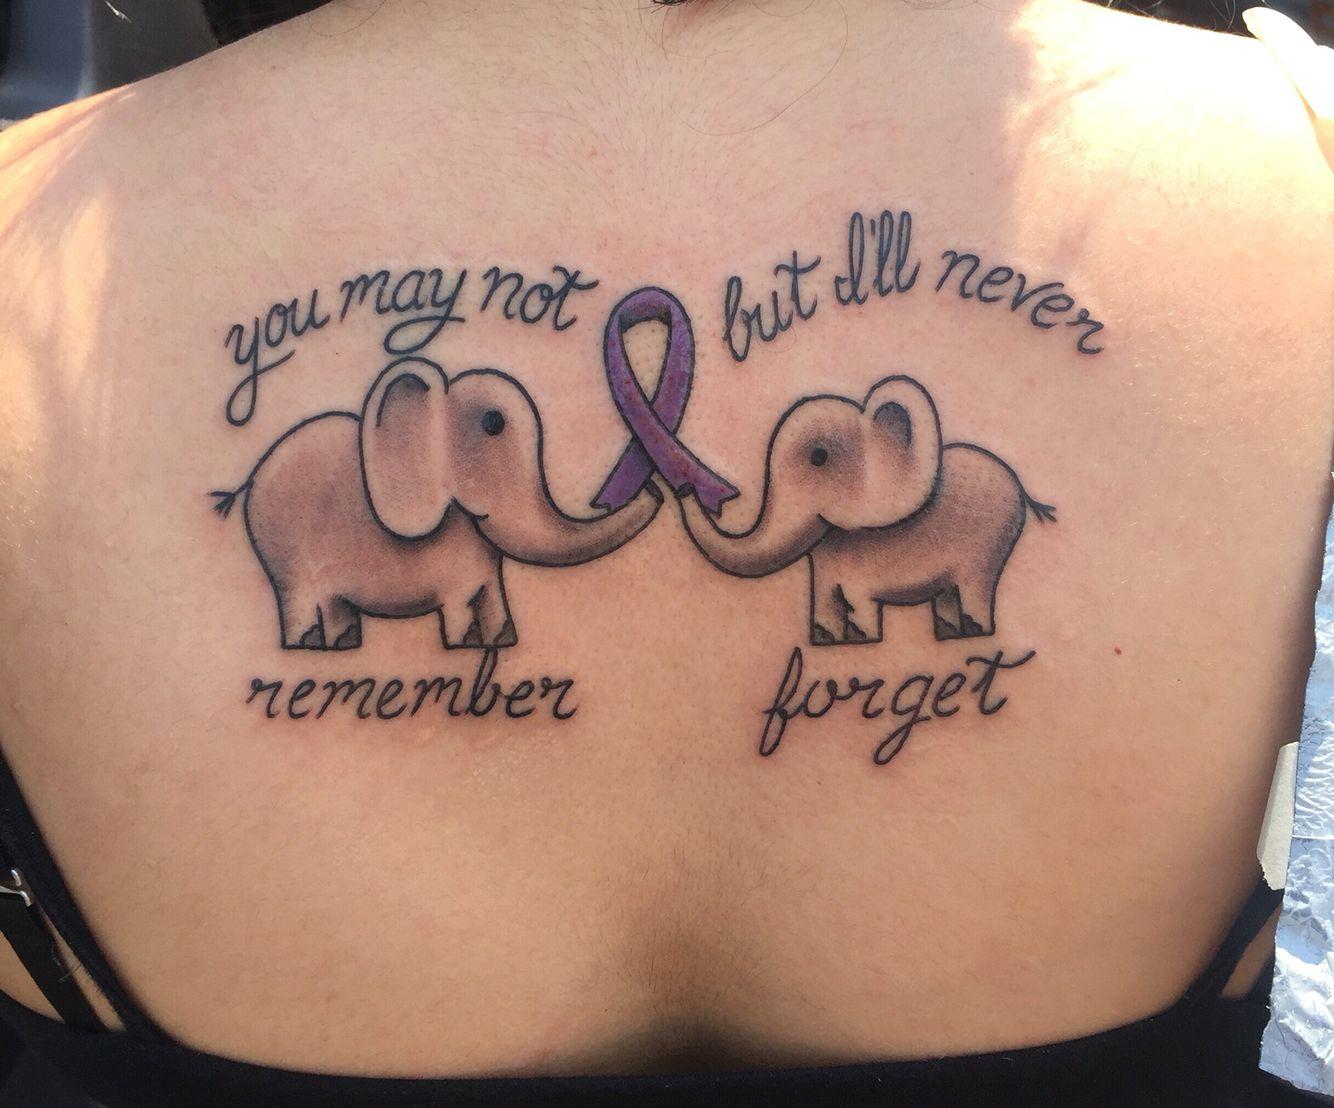 b25b2ca15cafd Tattoo for my Grandma with Alzheimer's. @angelamaldonado Tattoo done by  Leejohn Dean @ Magic Rooster Tattoo in Mauldin, SC